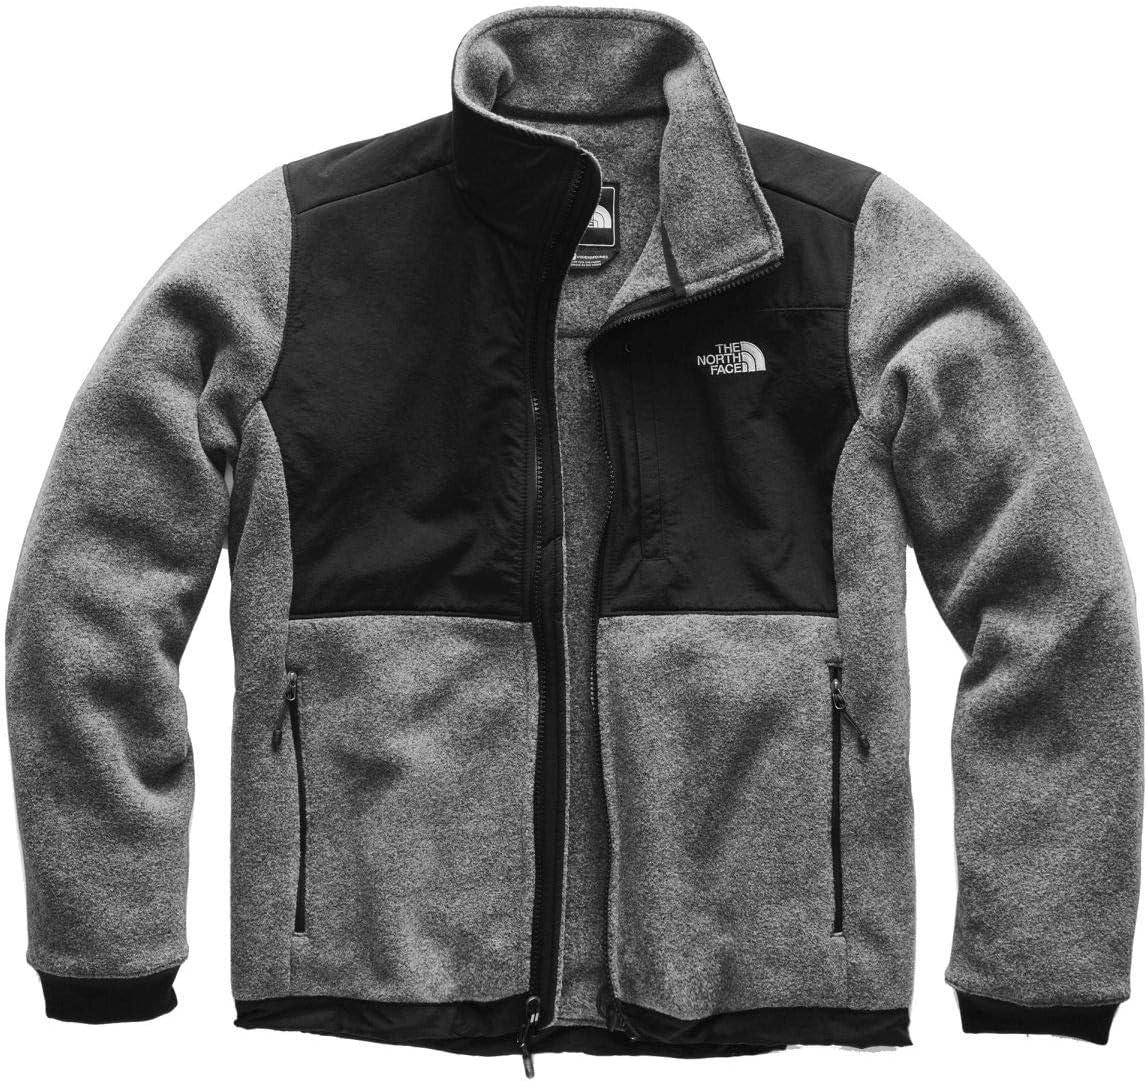 The North Face Denali 2 Jacket Women's